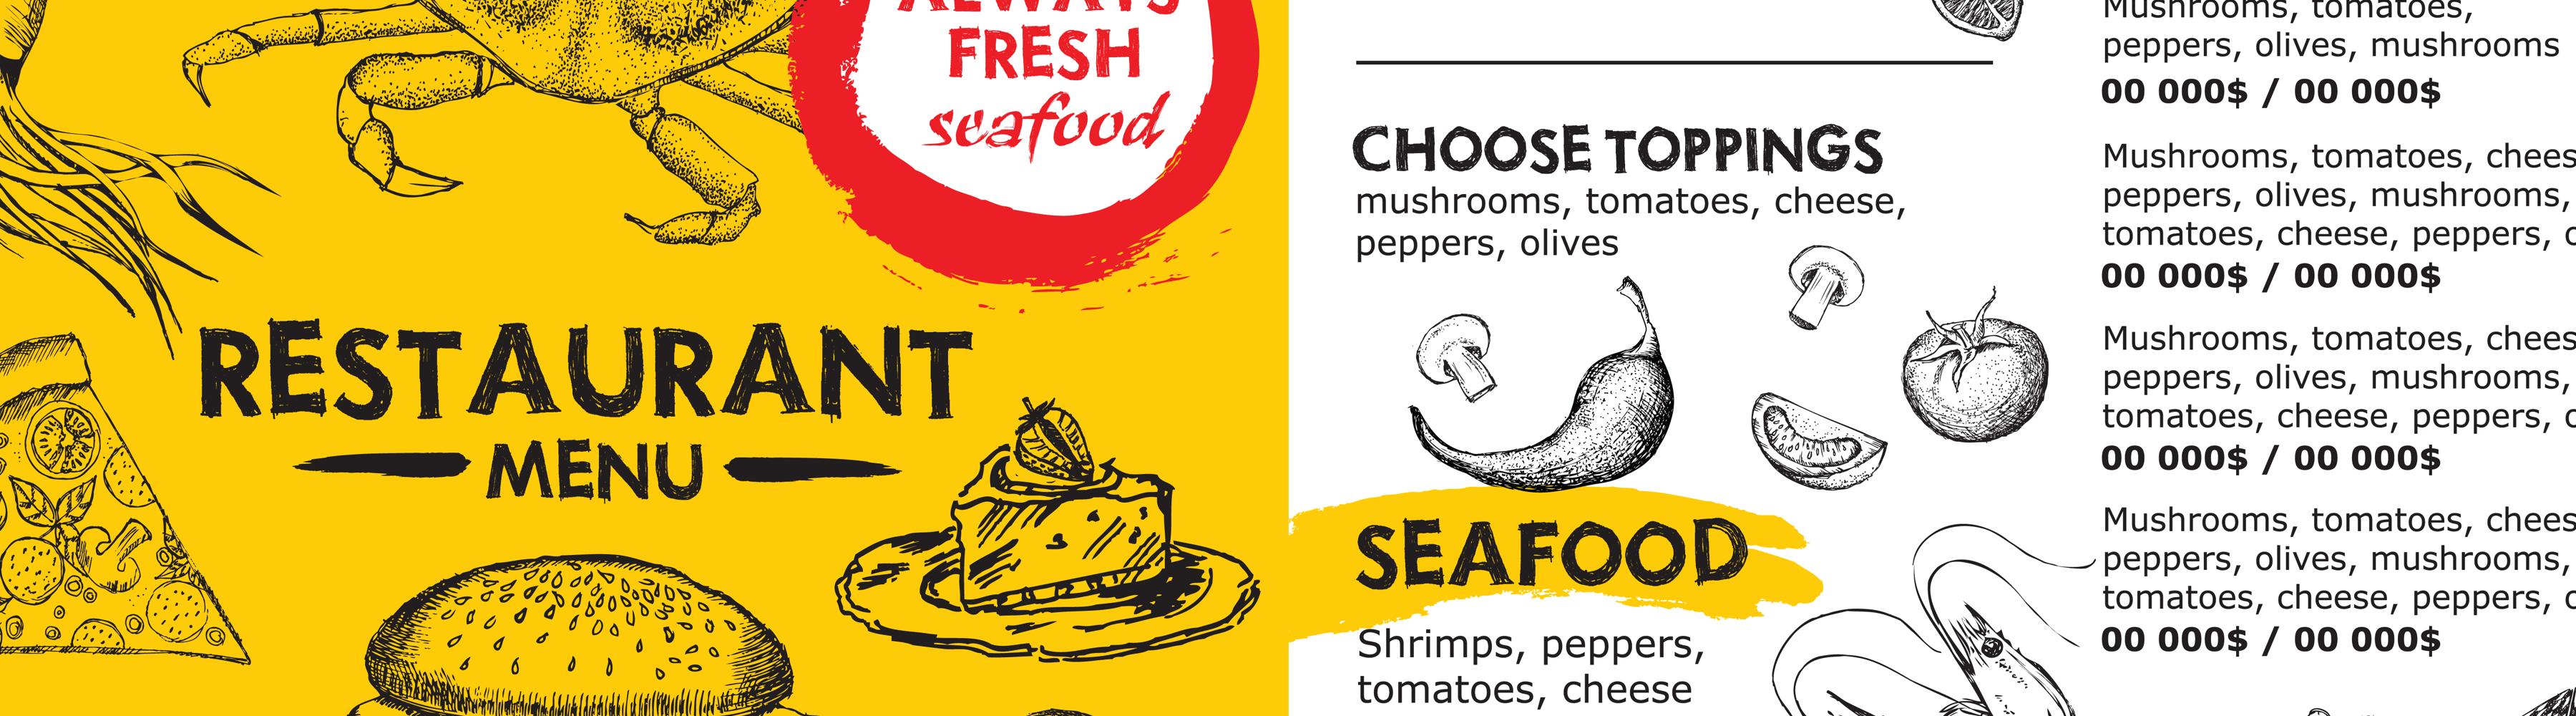 Créer des menus: exemples et explications